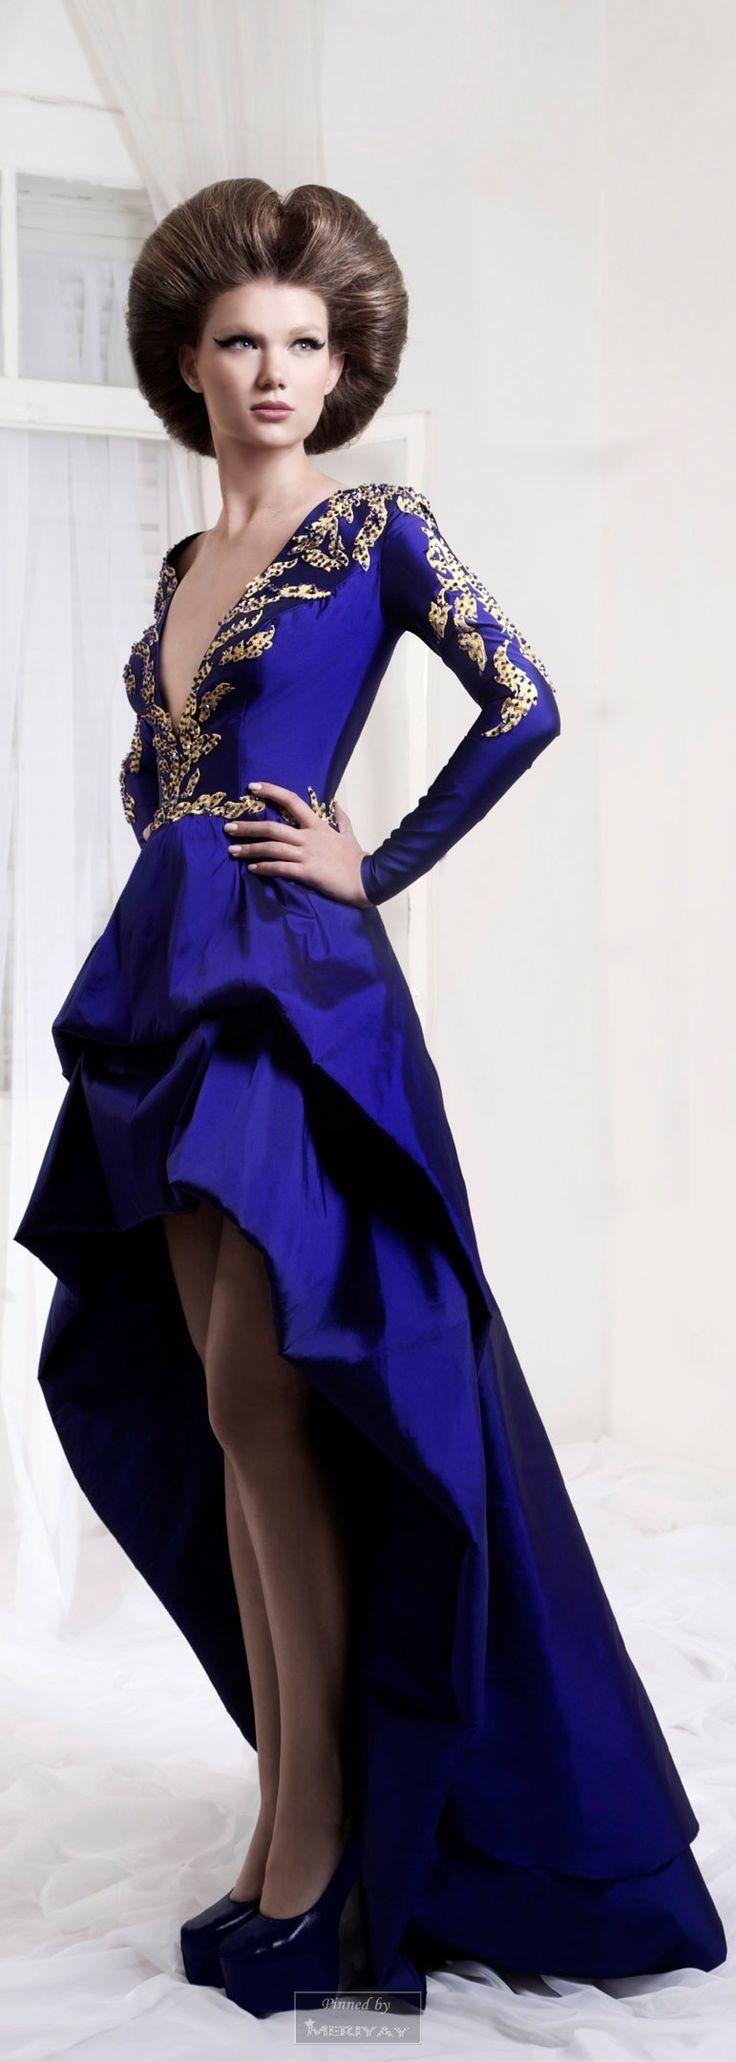 Tarek Sinno. http://fashion.tinydeal.com/clothing-px2eyq9-c-341.html